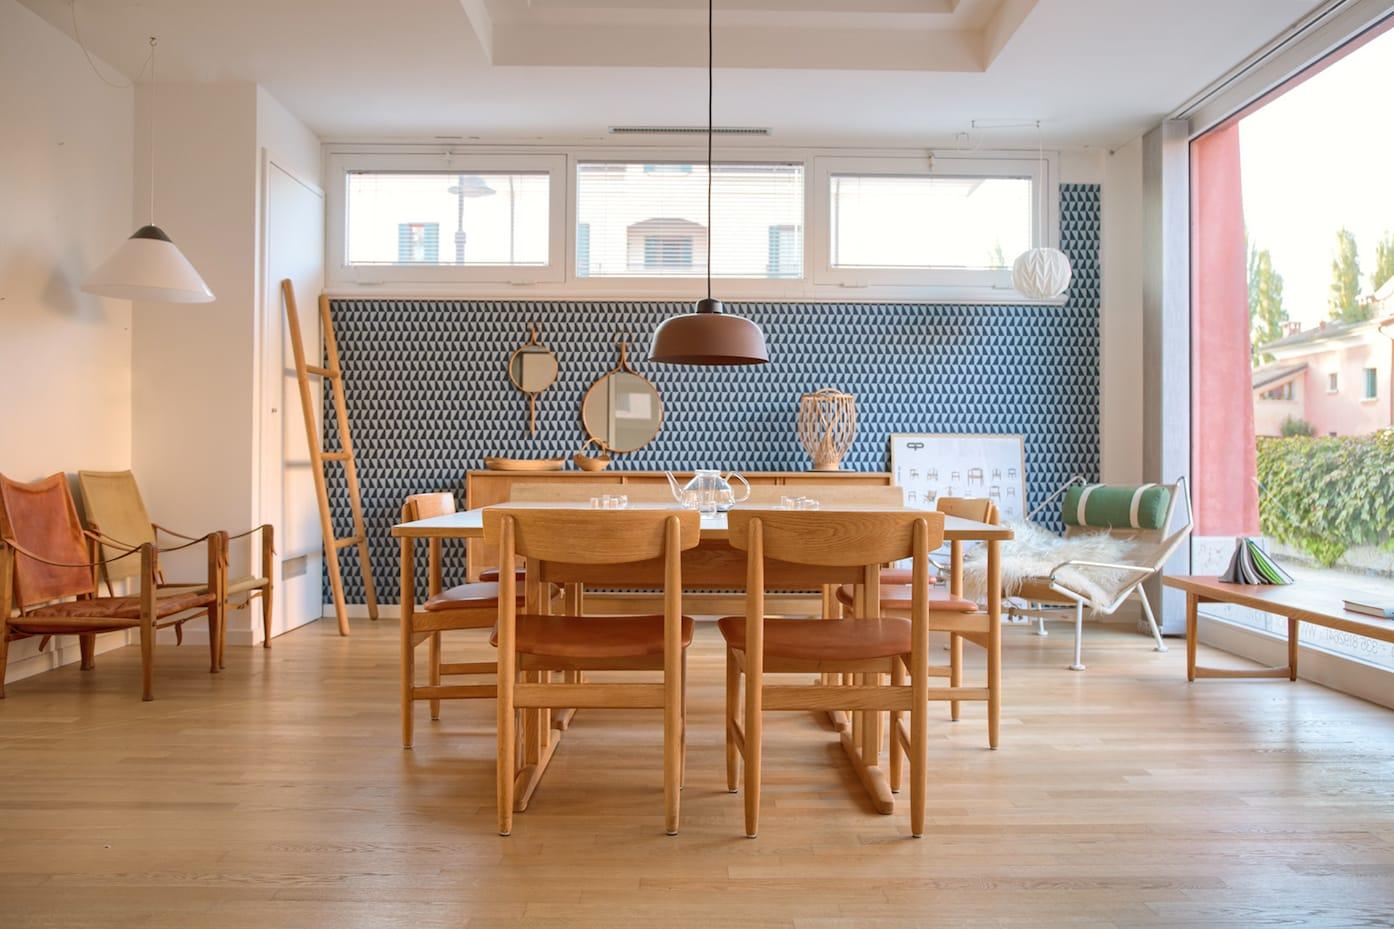 Danord scandianvian furniture in italy interni magazine for Interni furniture